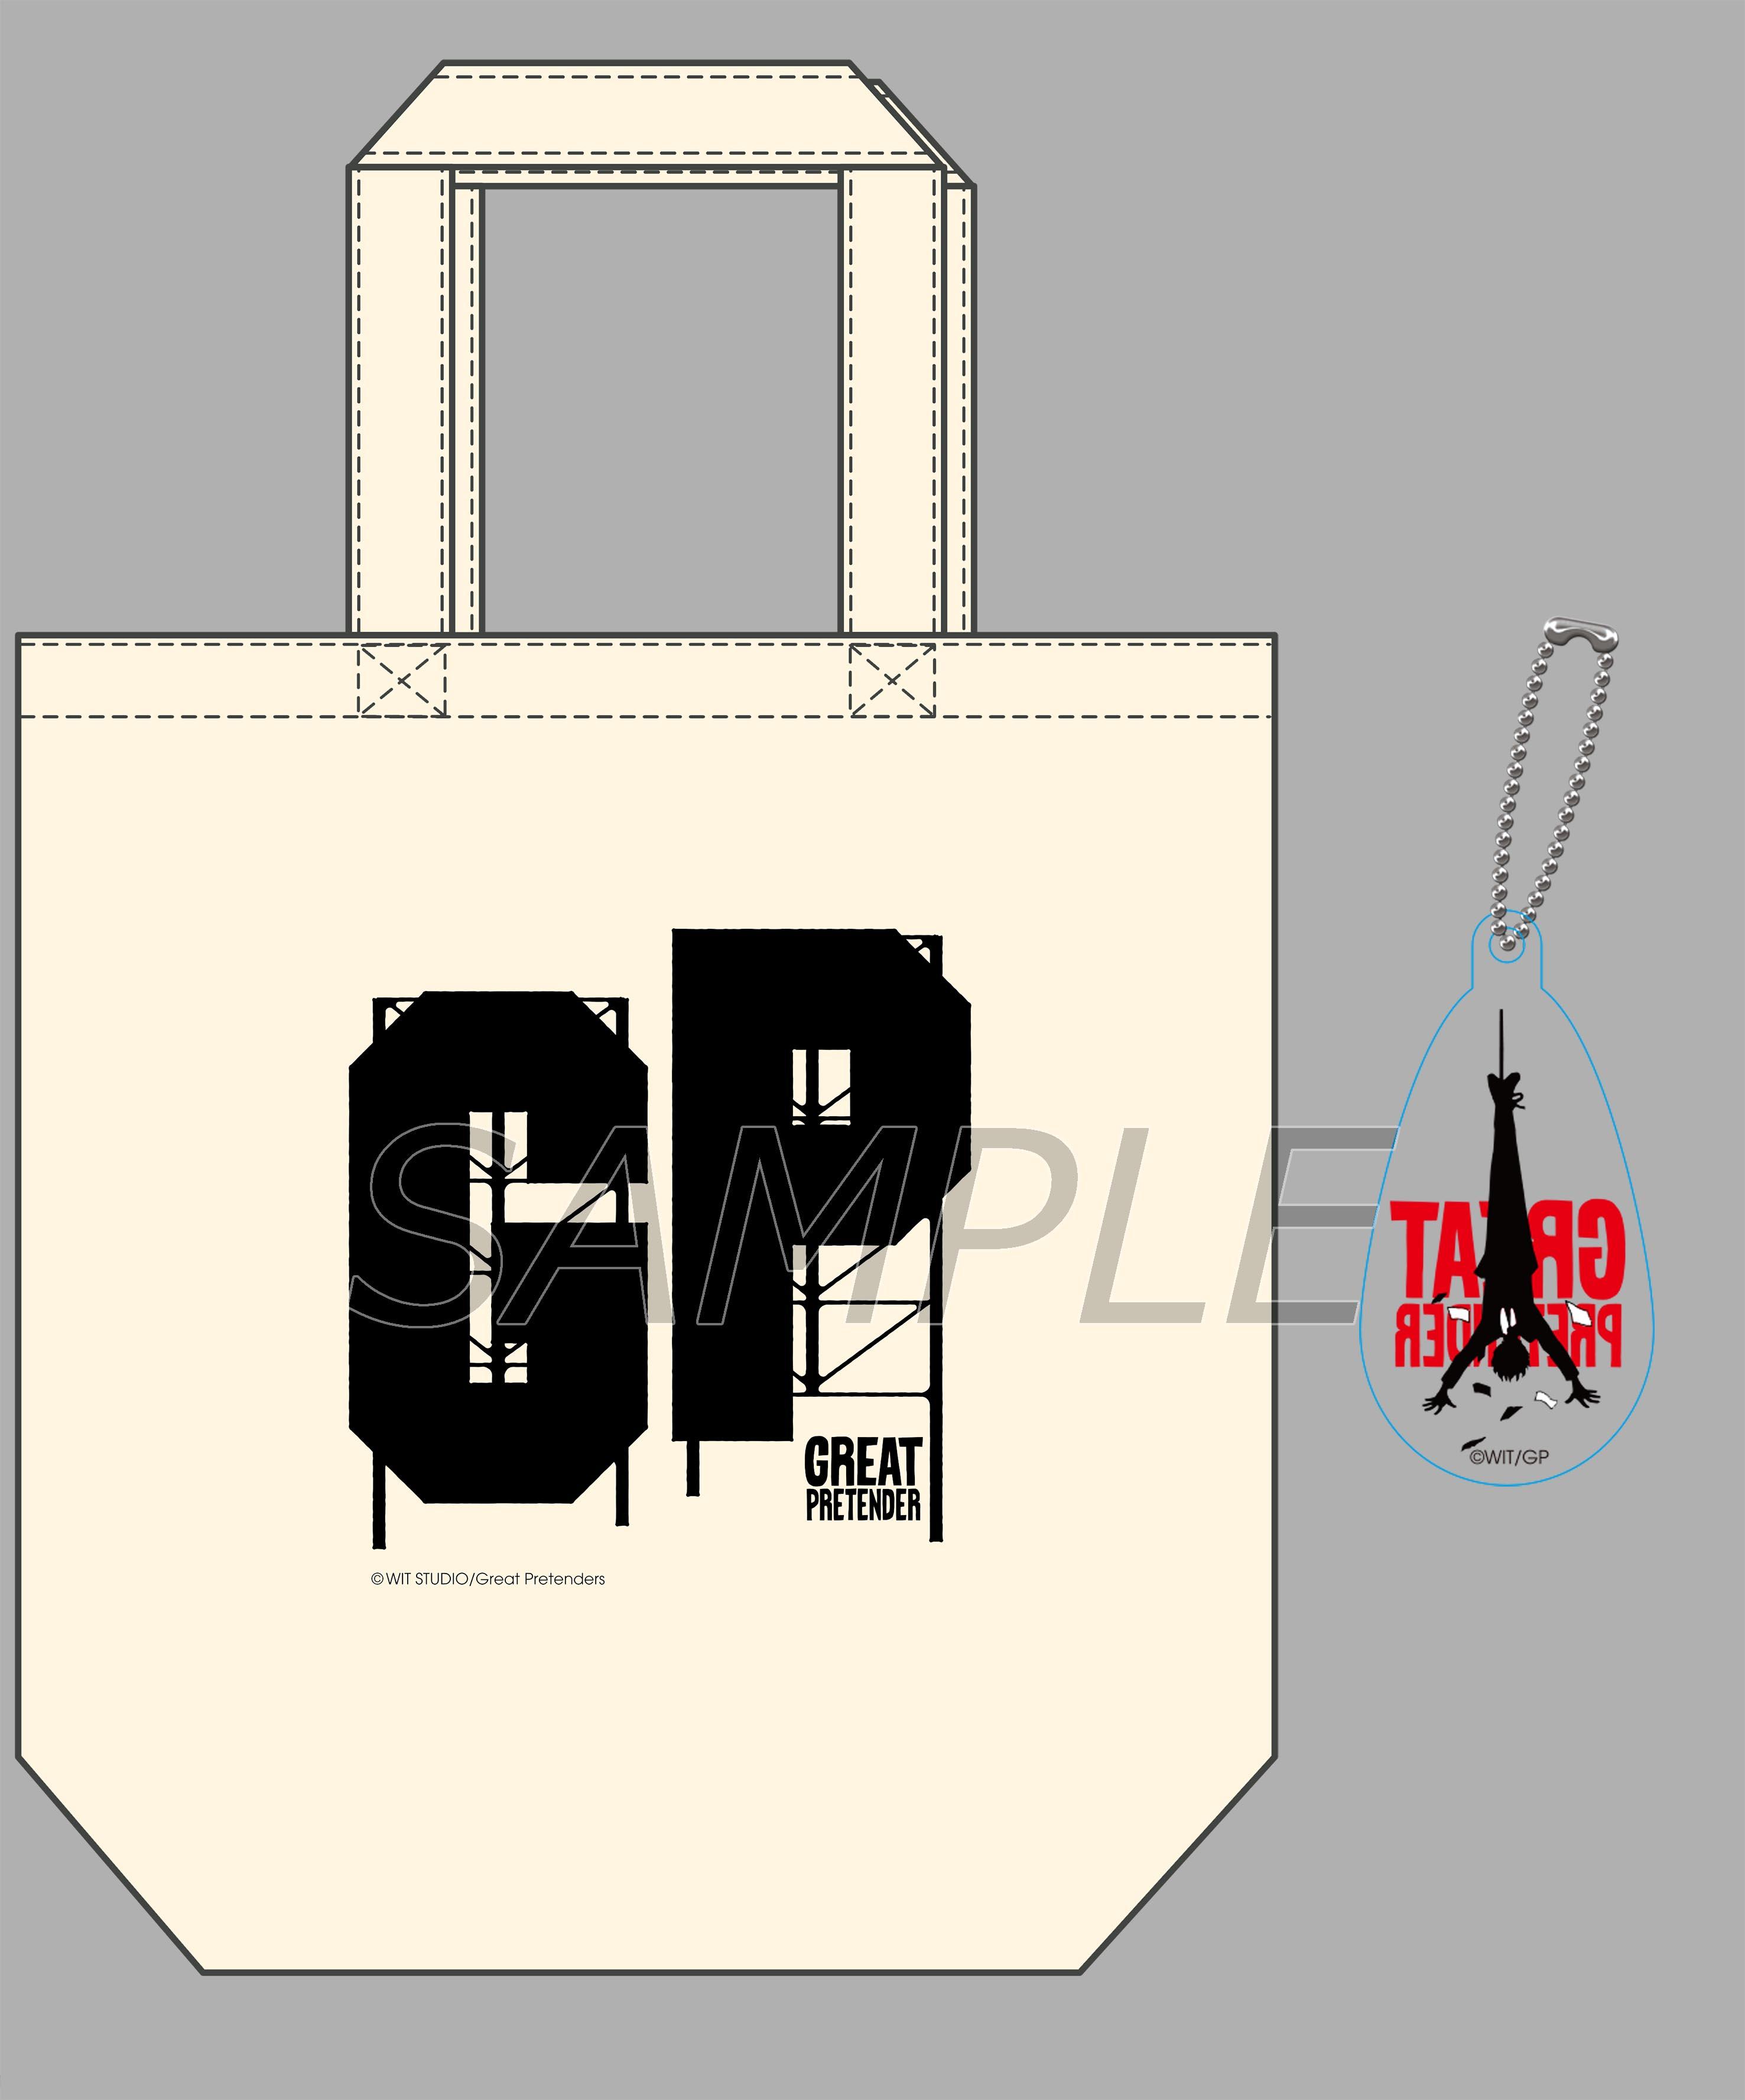 『GREAT PRETENDER』新商品が発売決定!